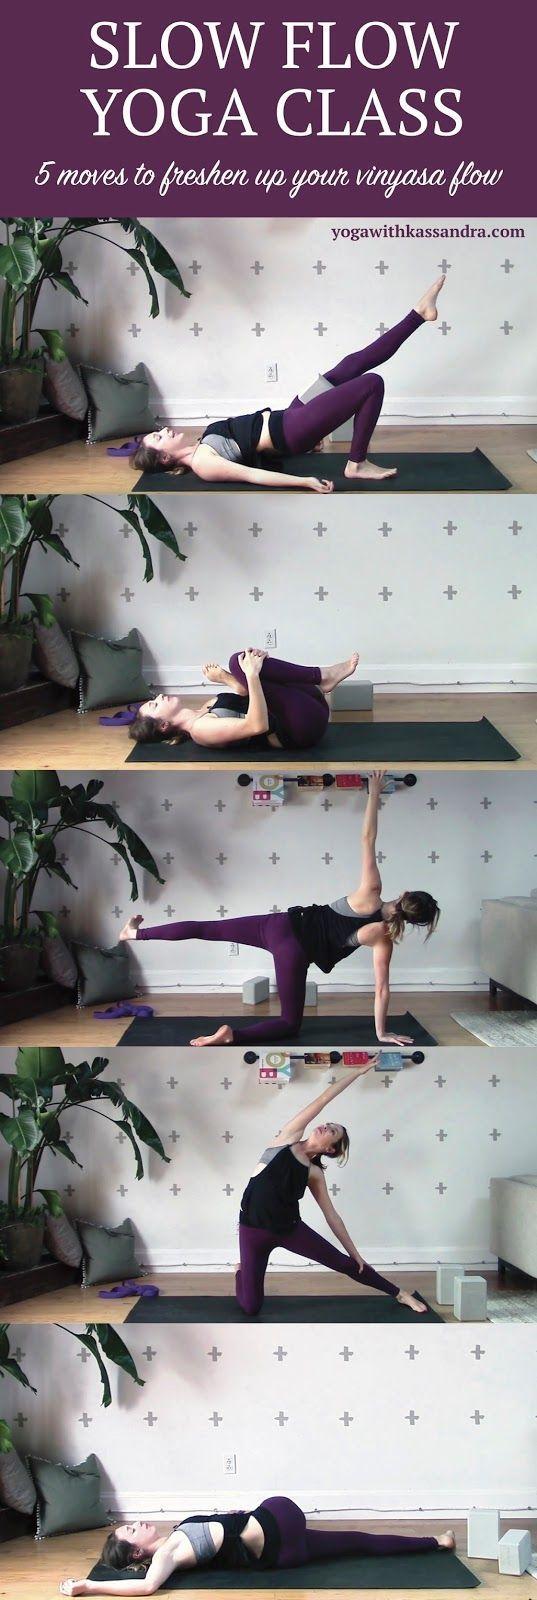 follow me @cushite Yoga with Kassandra offers free online Yin Yoga & Vinyasa Flow yoga classes, daily yoga inspiration and yoga pose demonstration!